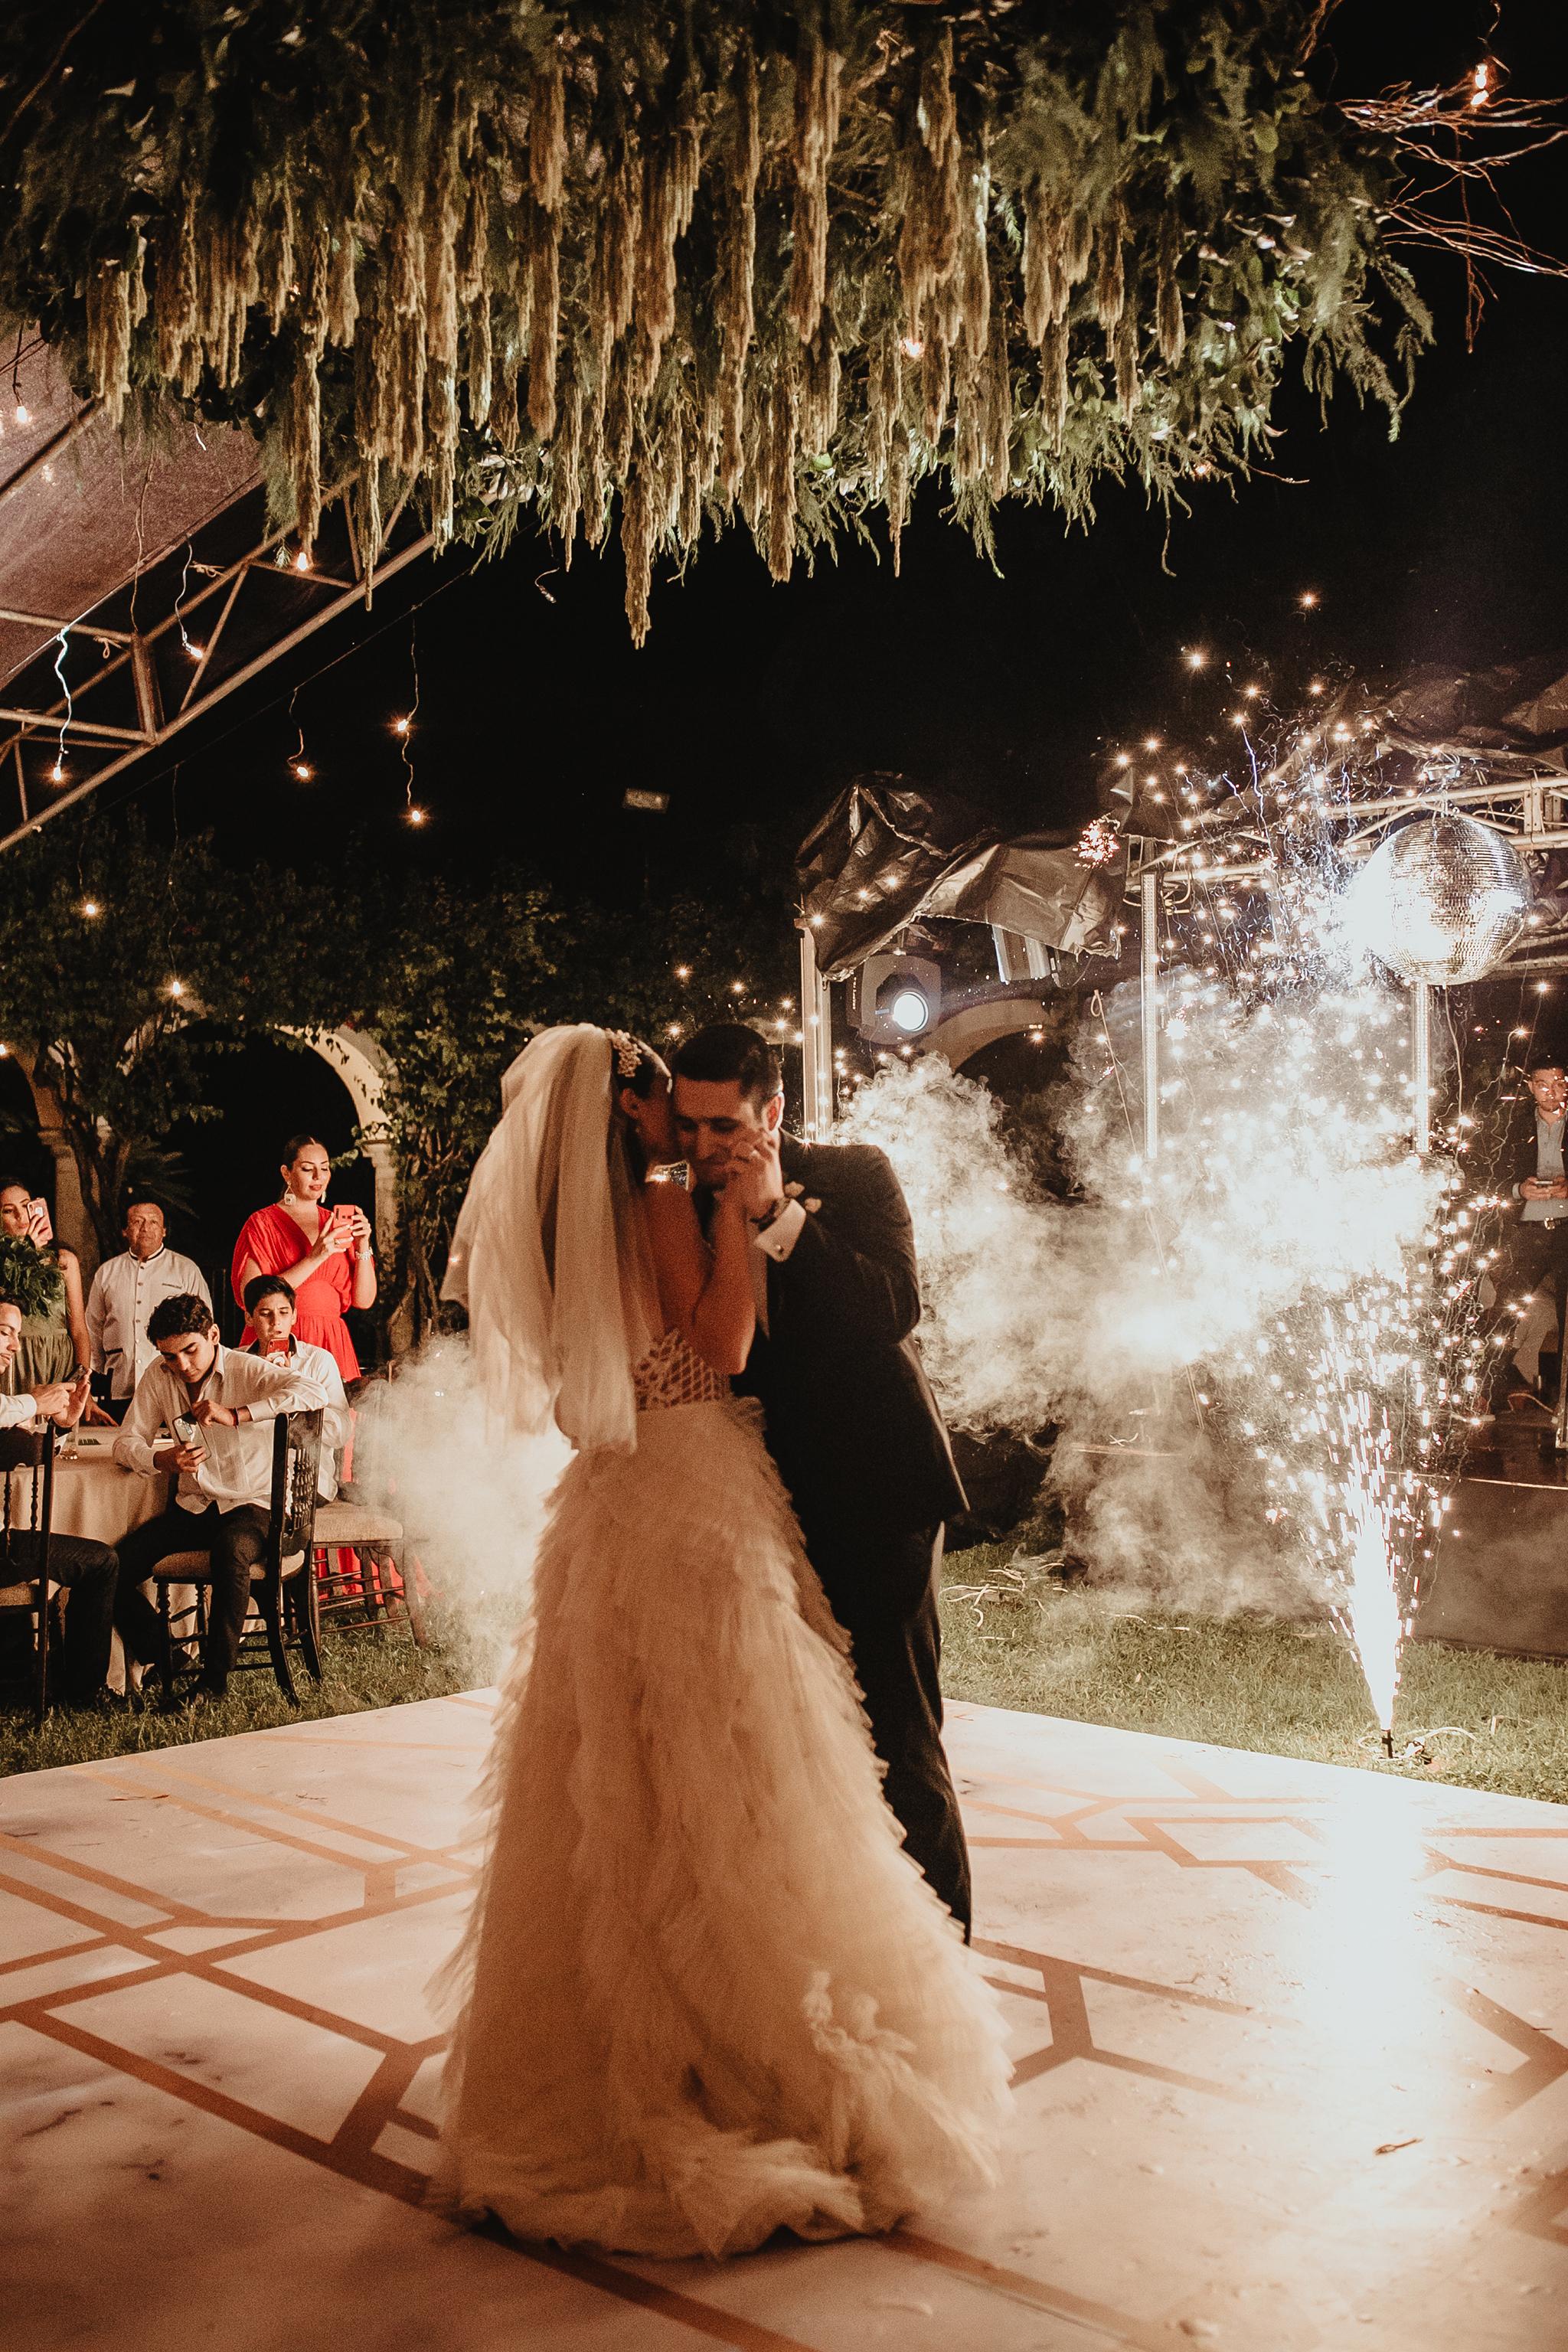 1112R&F__WeddingDestination_Weddingmerida_BodaMexico_FotografoDeBodas_FabrizioSimoneenFotografo.jpg